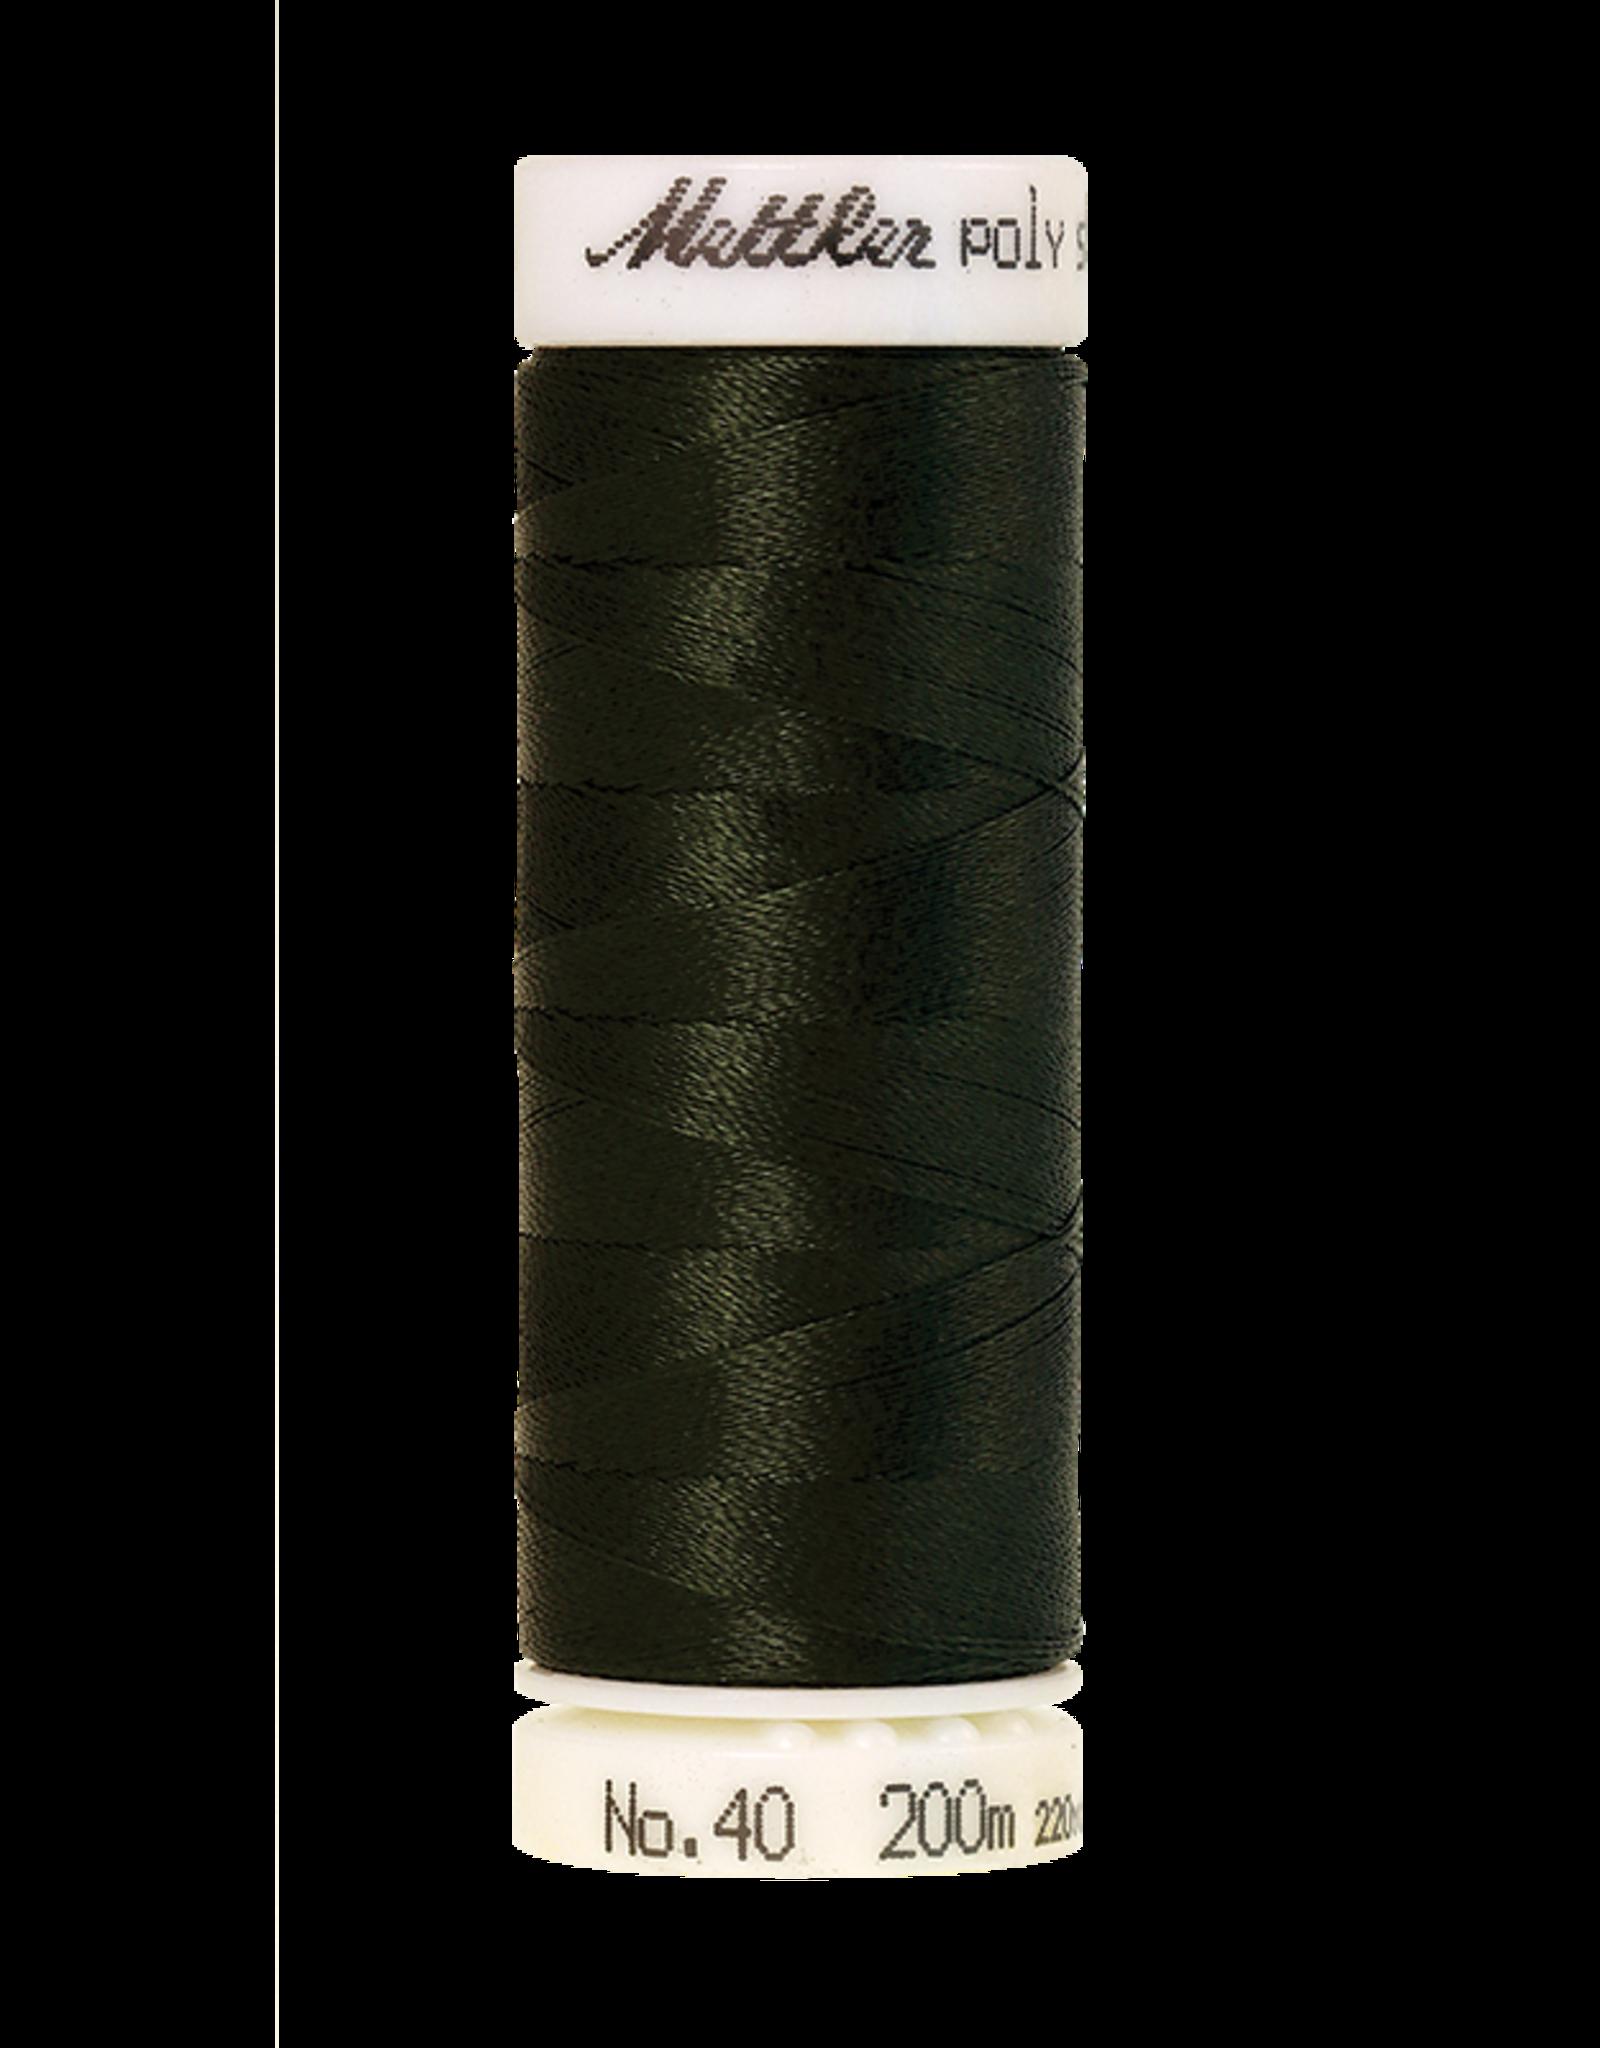 Mettler Mettler Poly Sheen 40 200m 5866